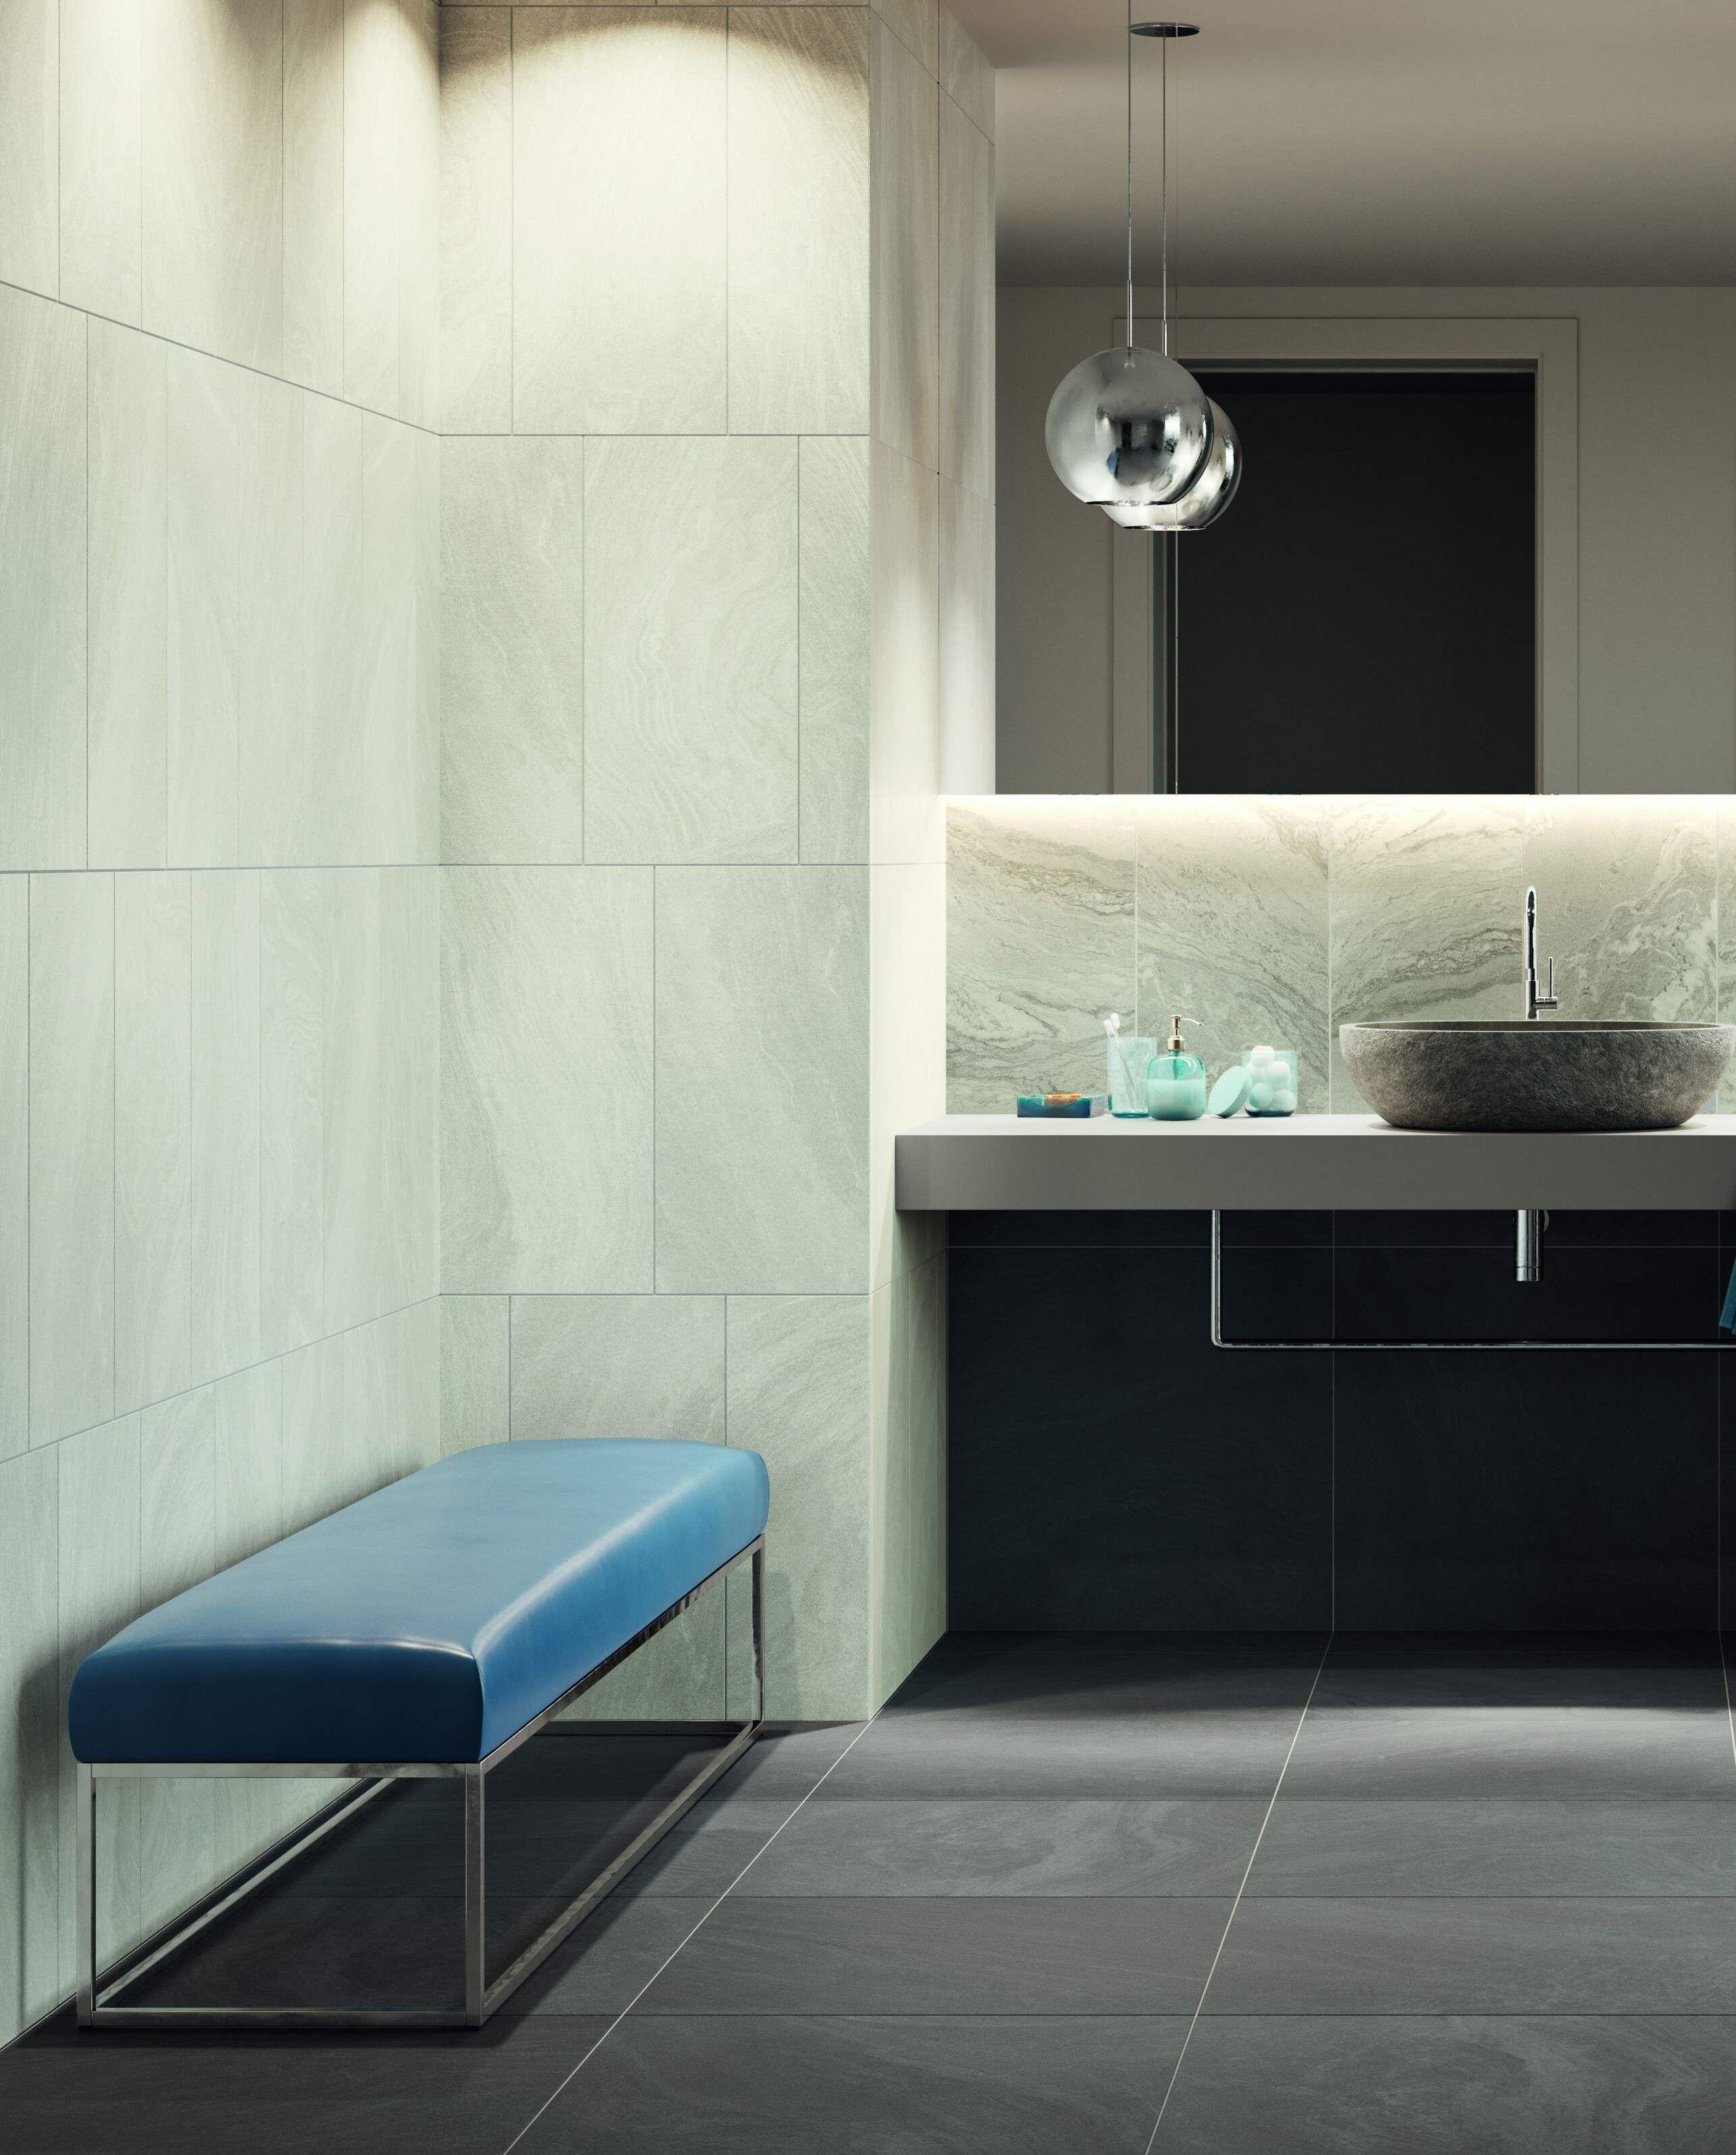 Badideen Fliesen Hochkant Verlegt Badezimmereinrichtung Badezimmer Innenausstattung Badezimmerideen